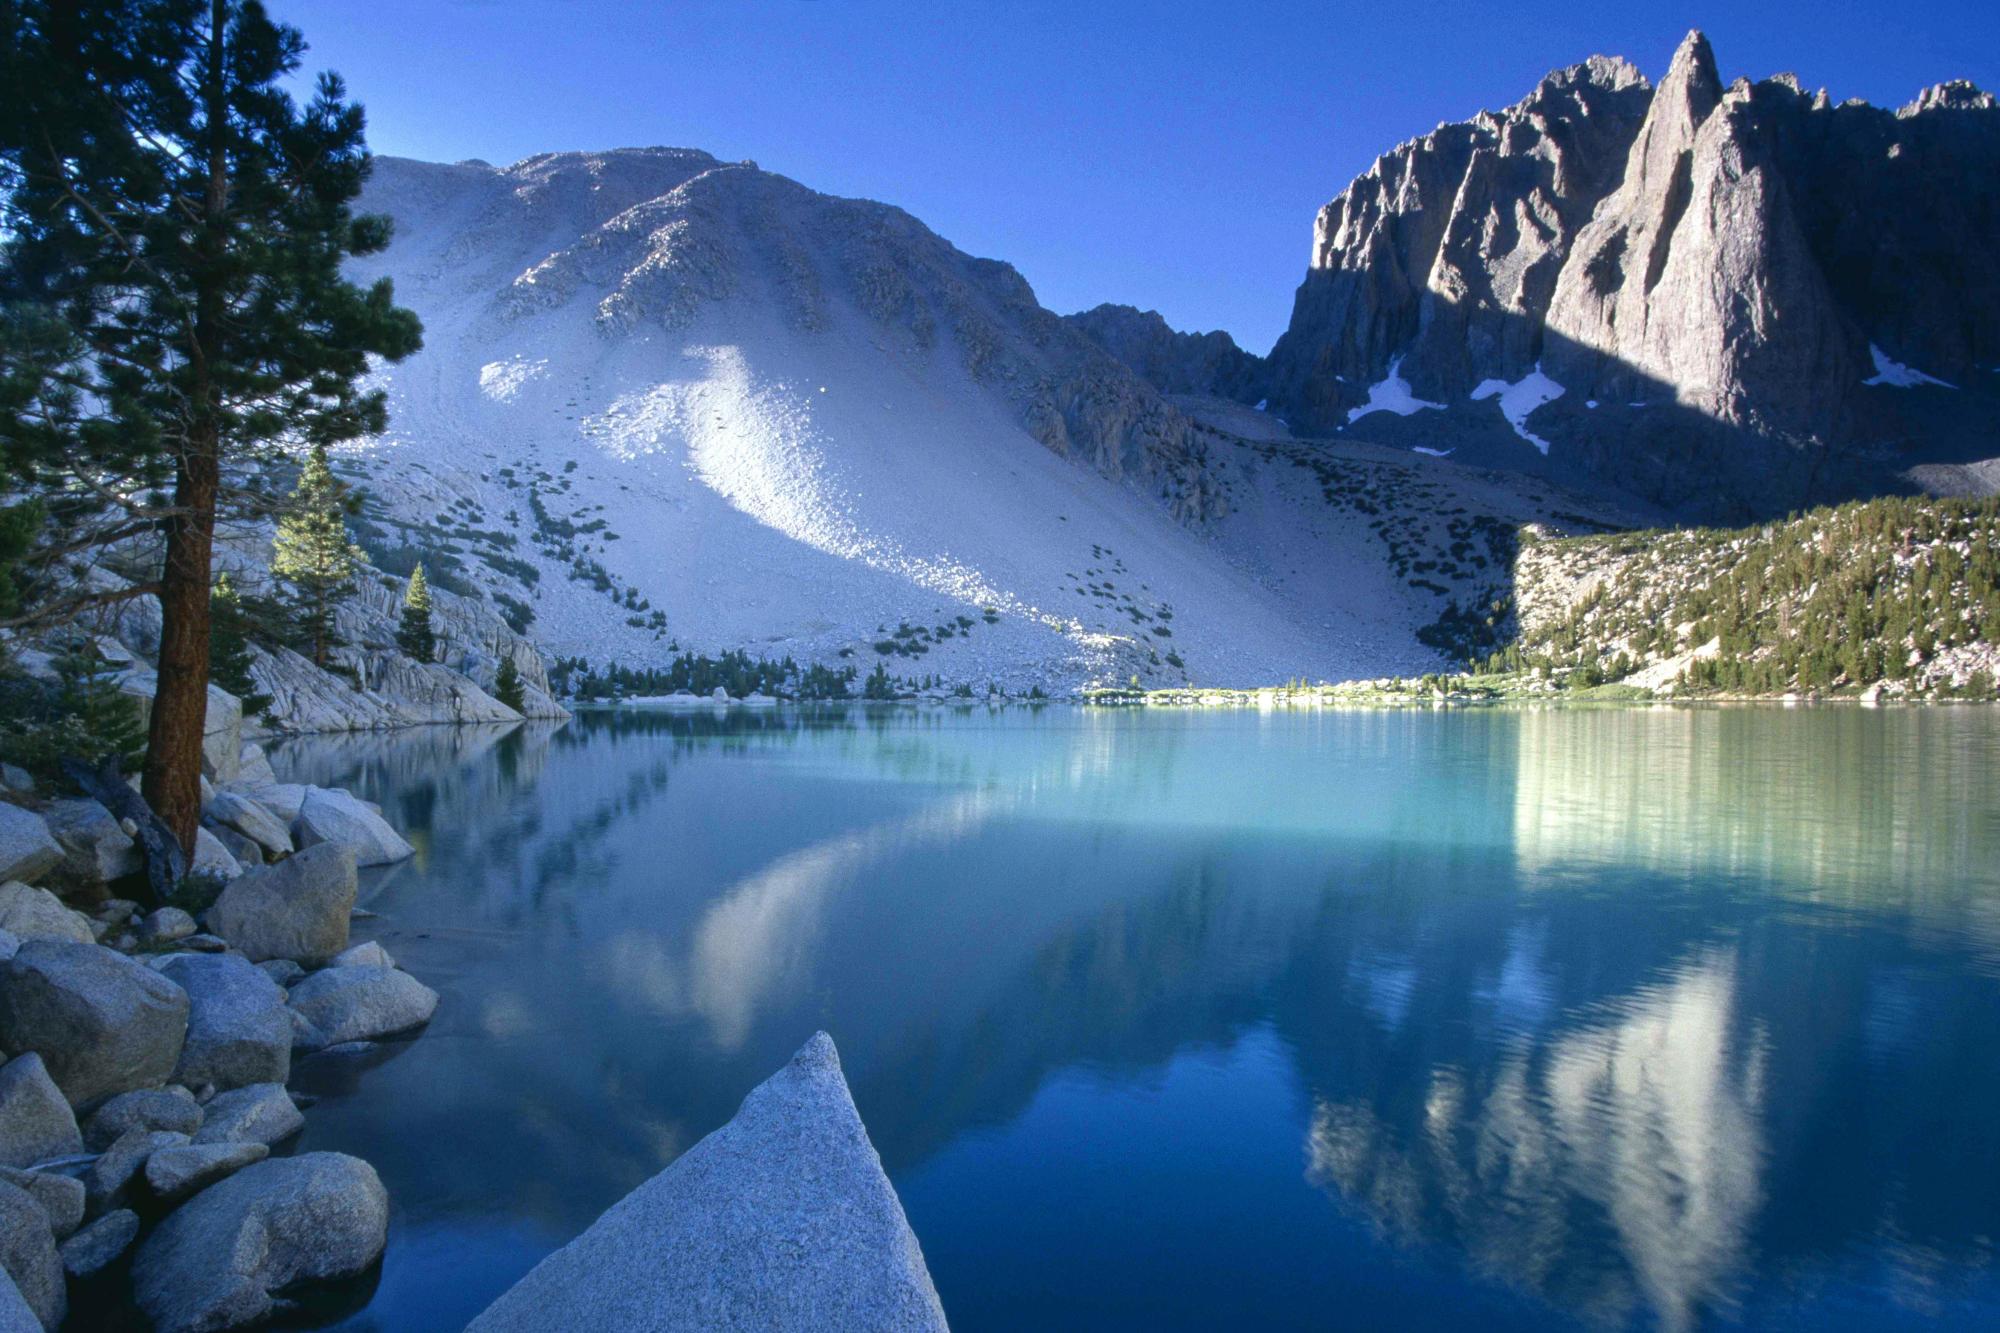 best HD Lake Wallpaper